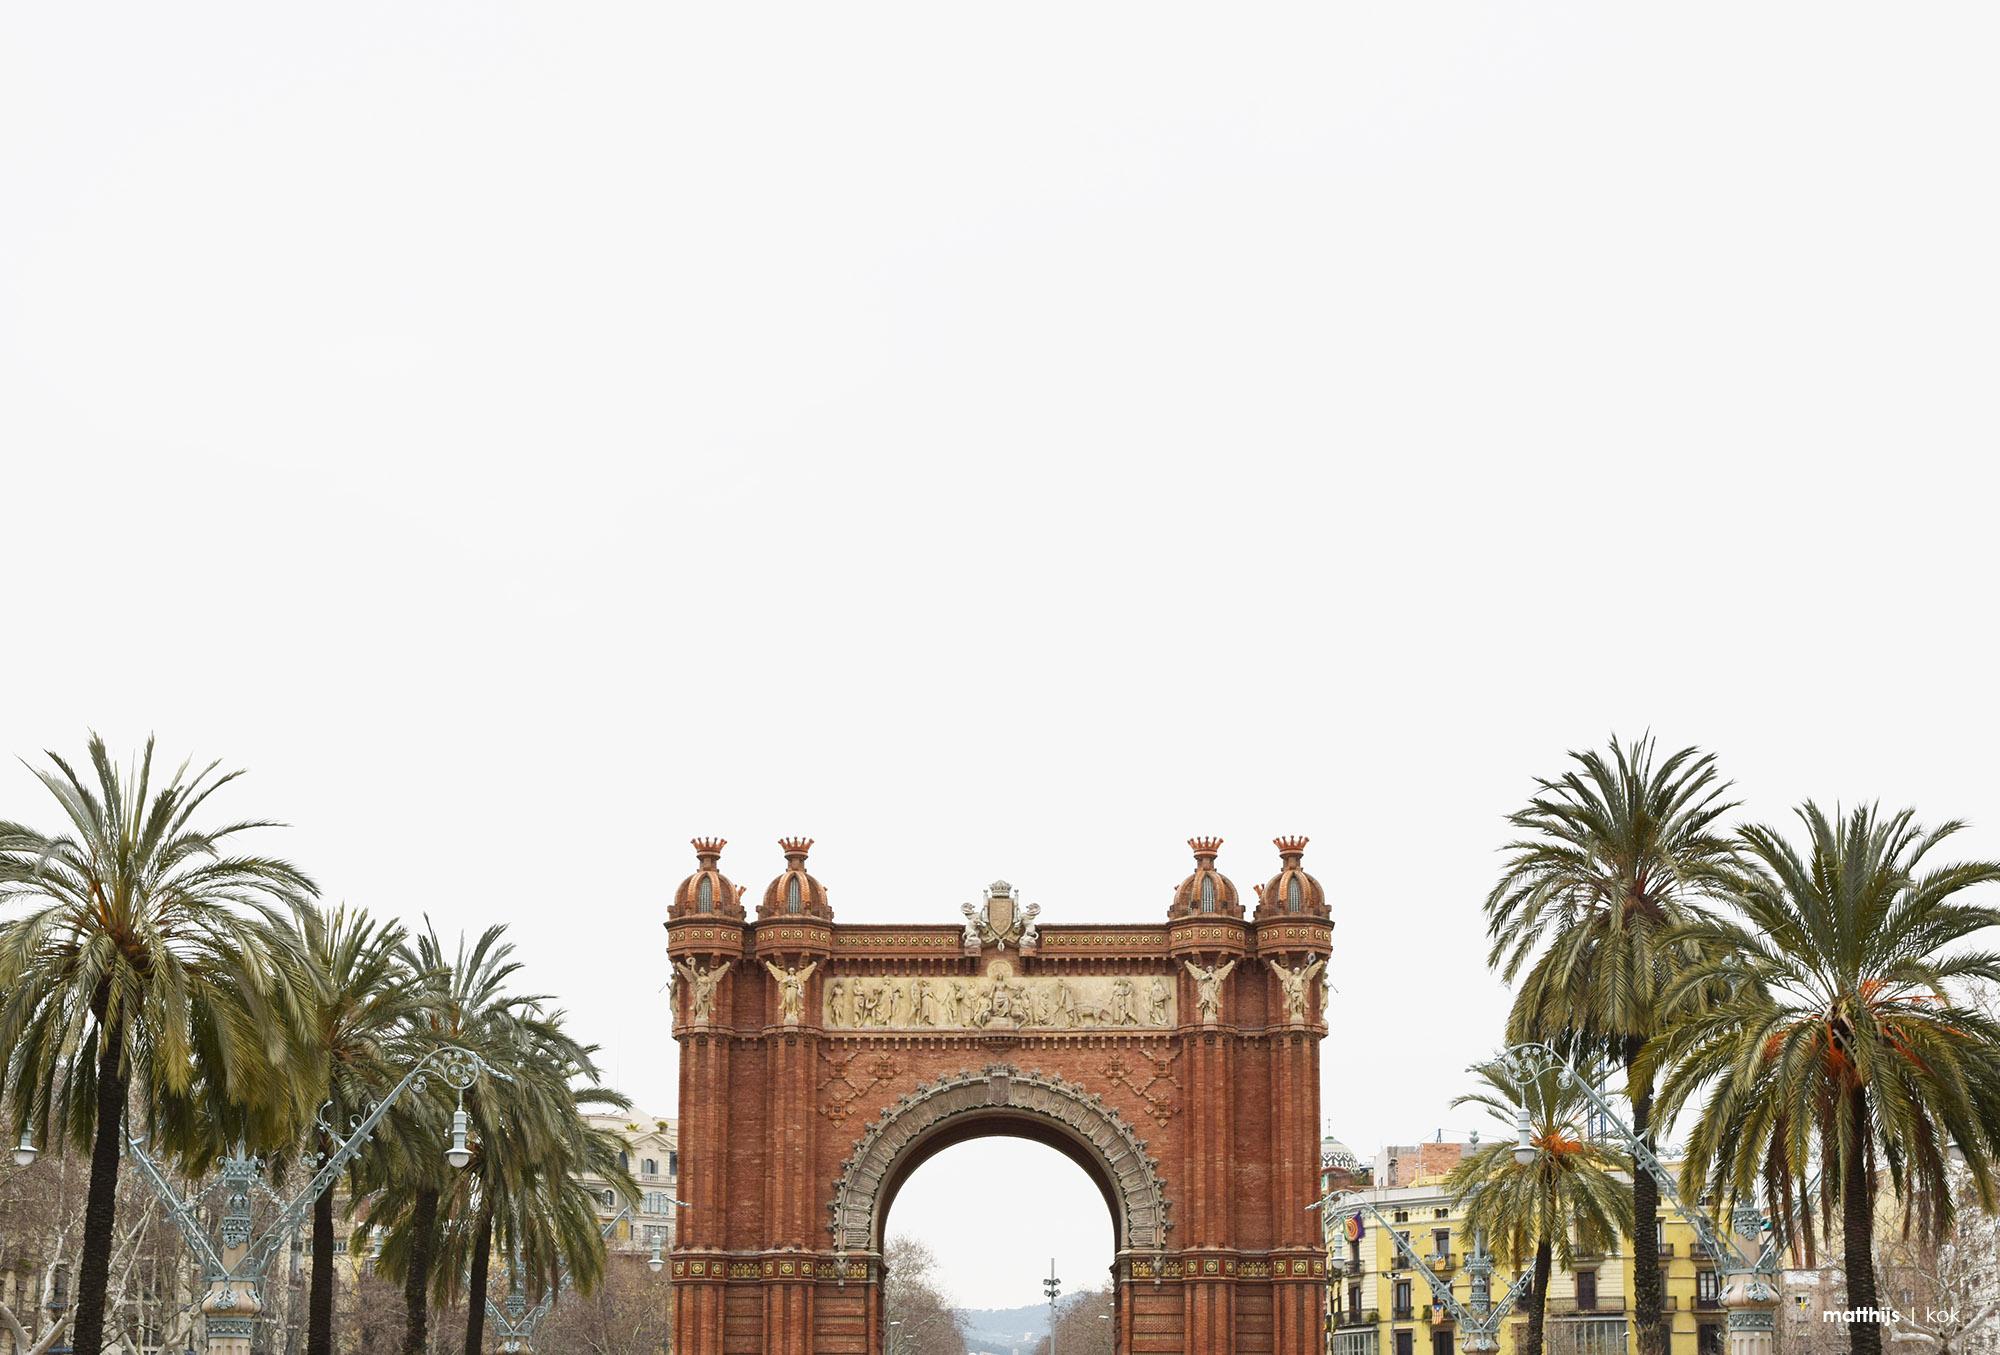 Arc de Triomf, Barcelona, Spain | Photo by Matthijs Kok